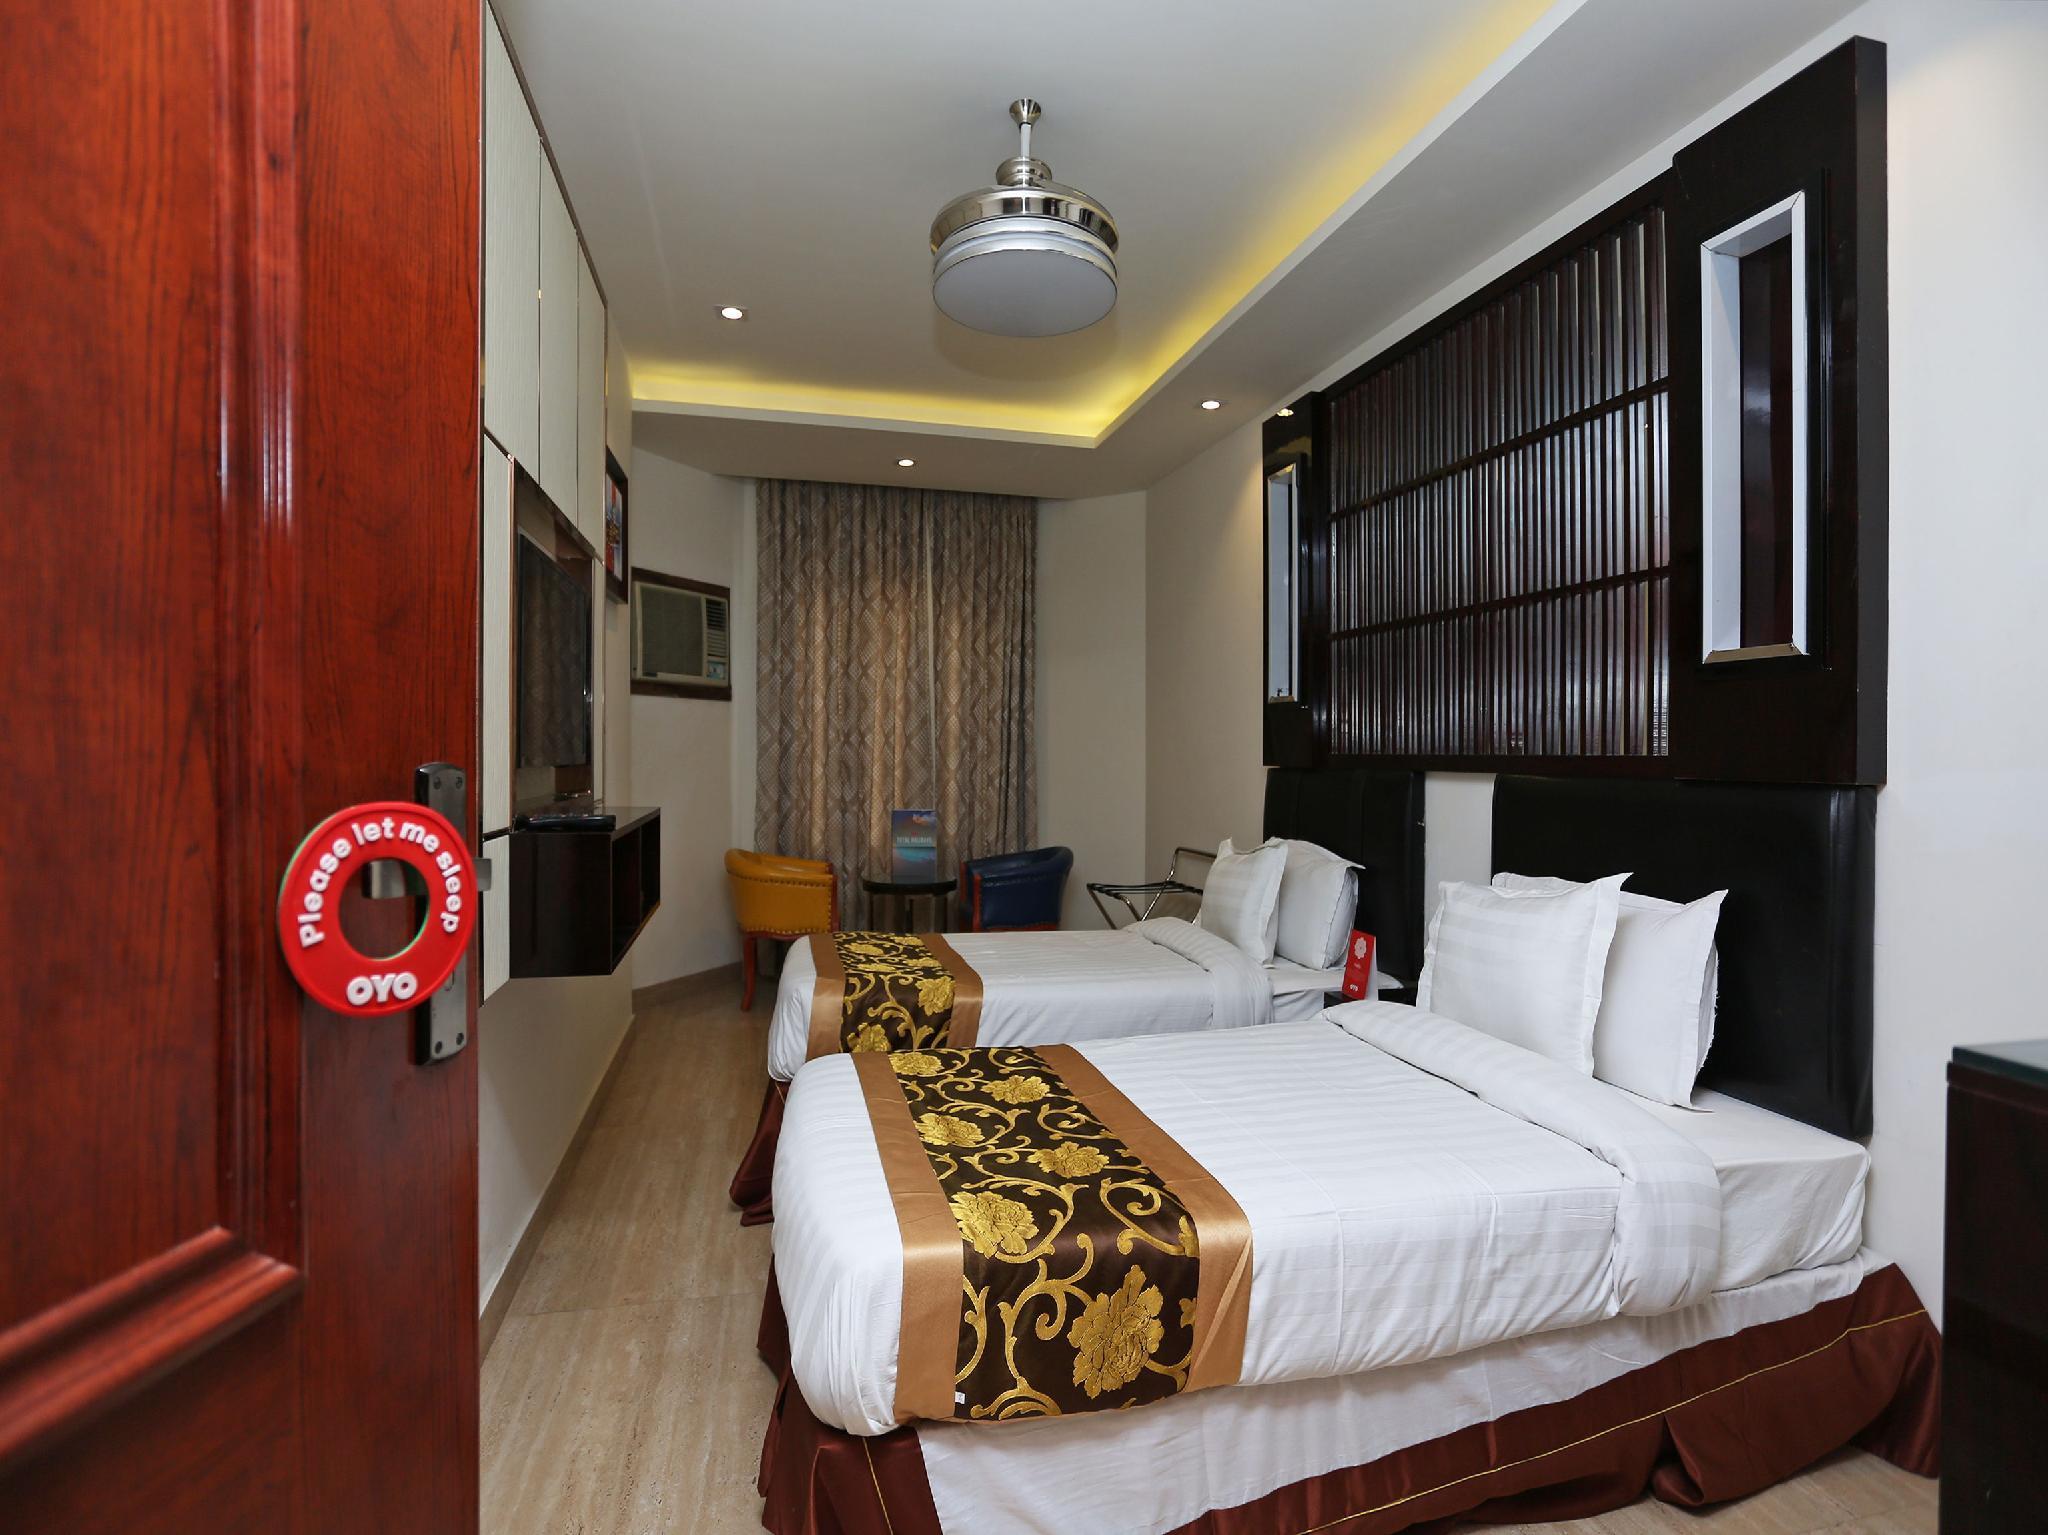 OYO 15384 Hotel New Anand Palace